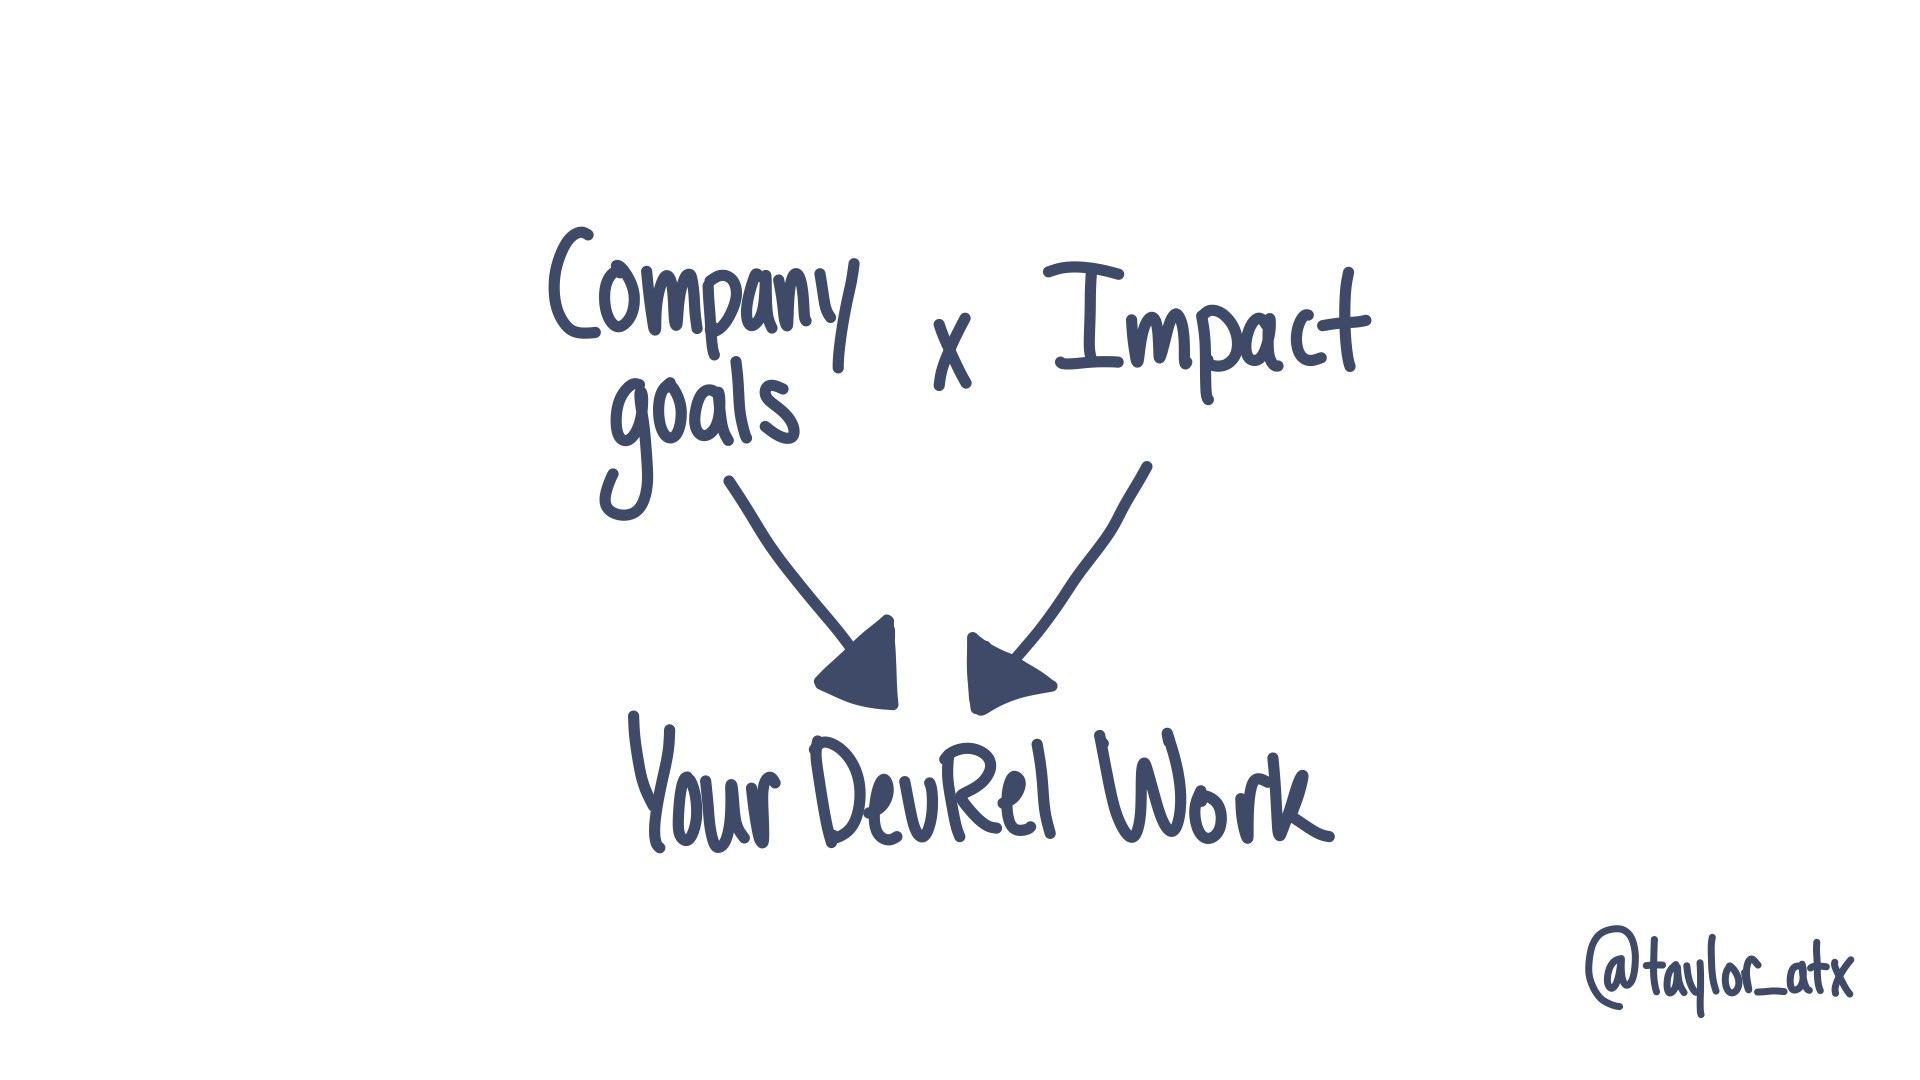 Company goals x potential impact = Your DevRel work